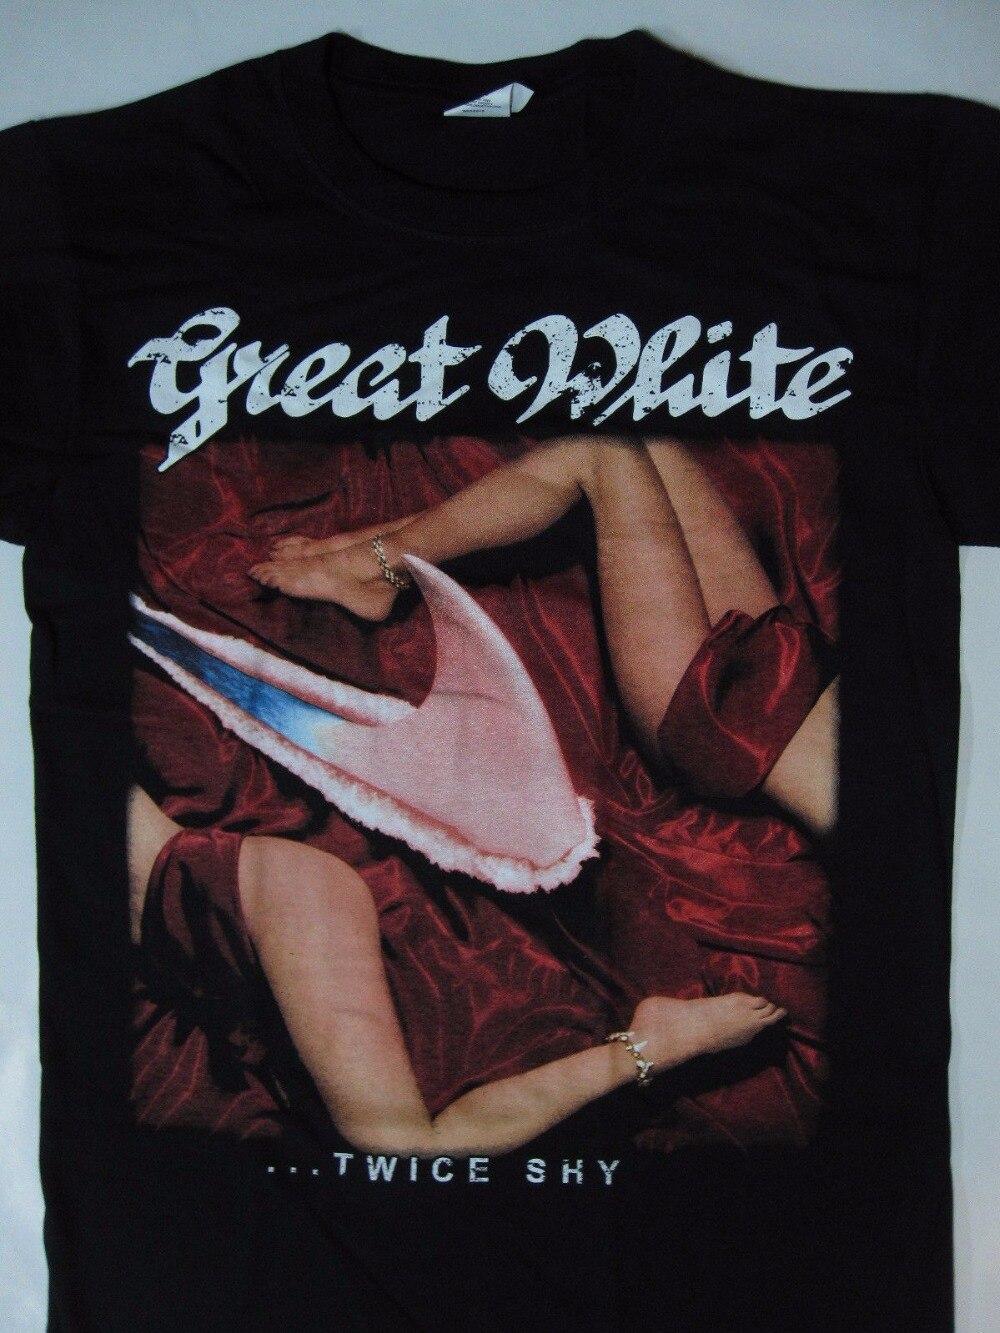 T Shirt Design Website Fashion Great White Twice Shy Tour 89 T-Shirt Short O-Neck T Shirts For Men